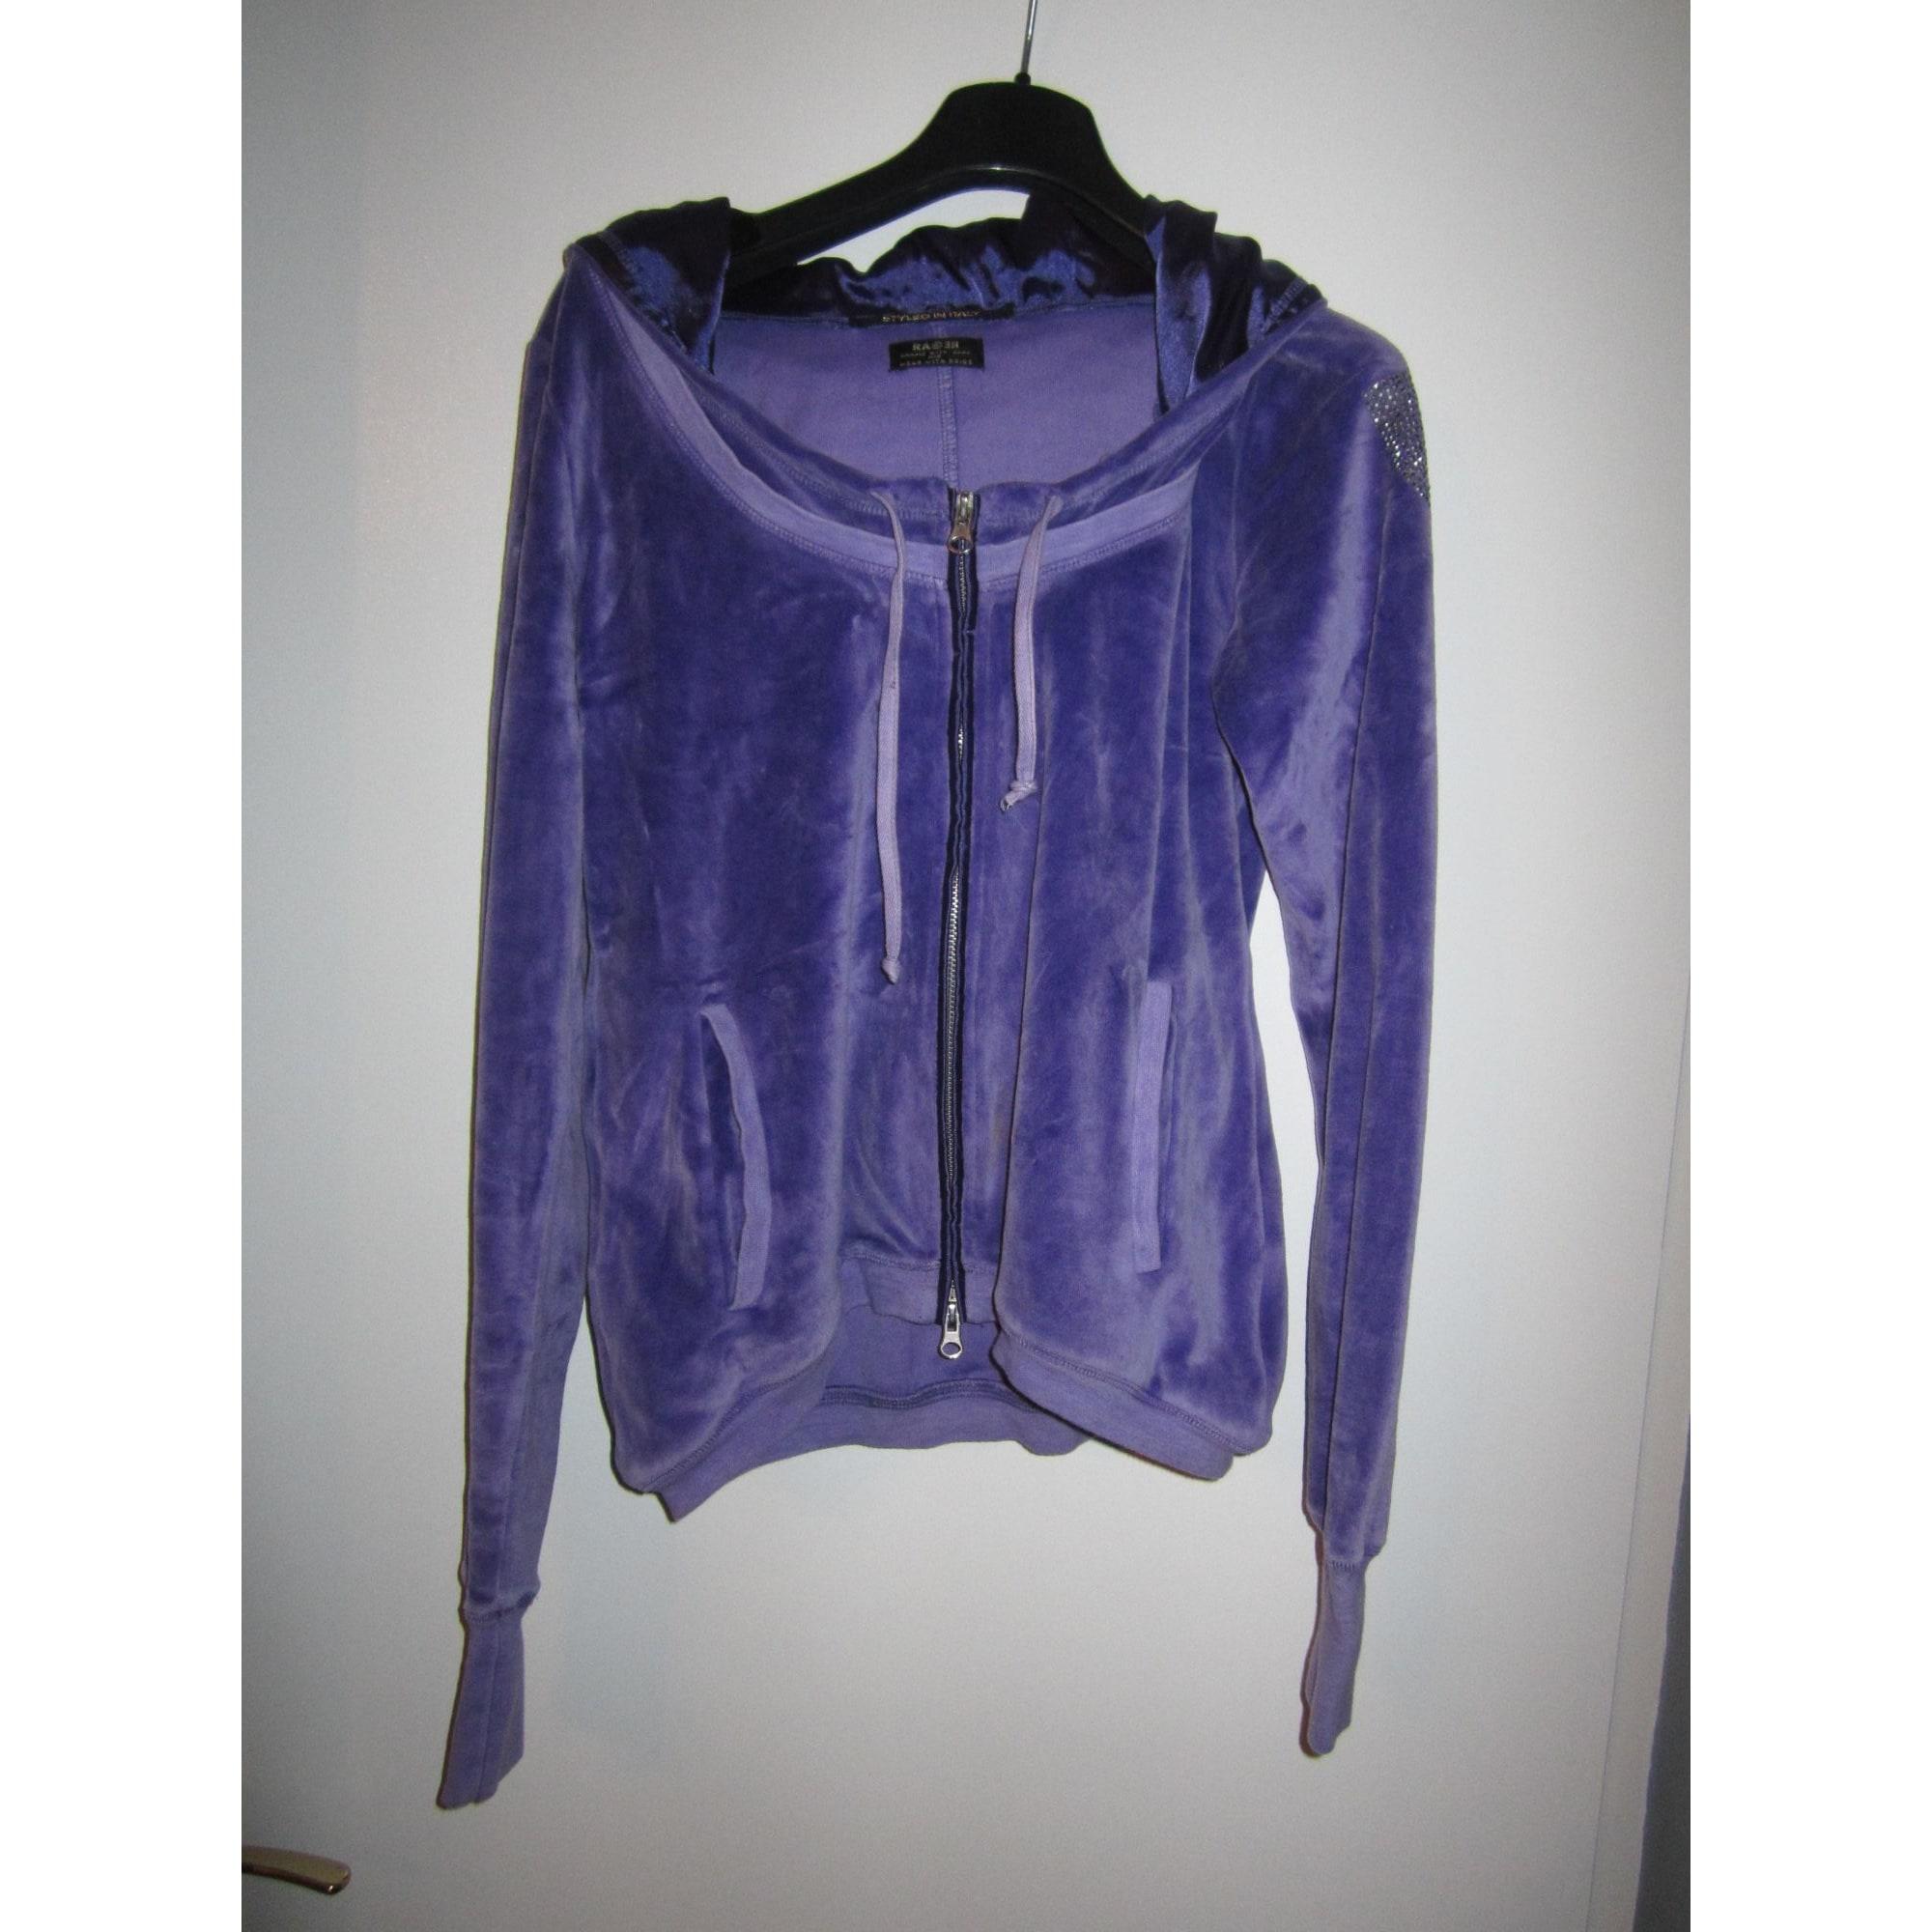 Gilet, cardigan RA-RE Violet, mauve, lavande